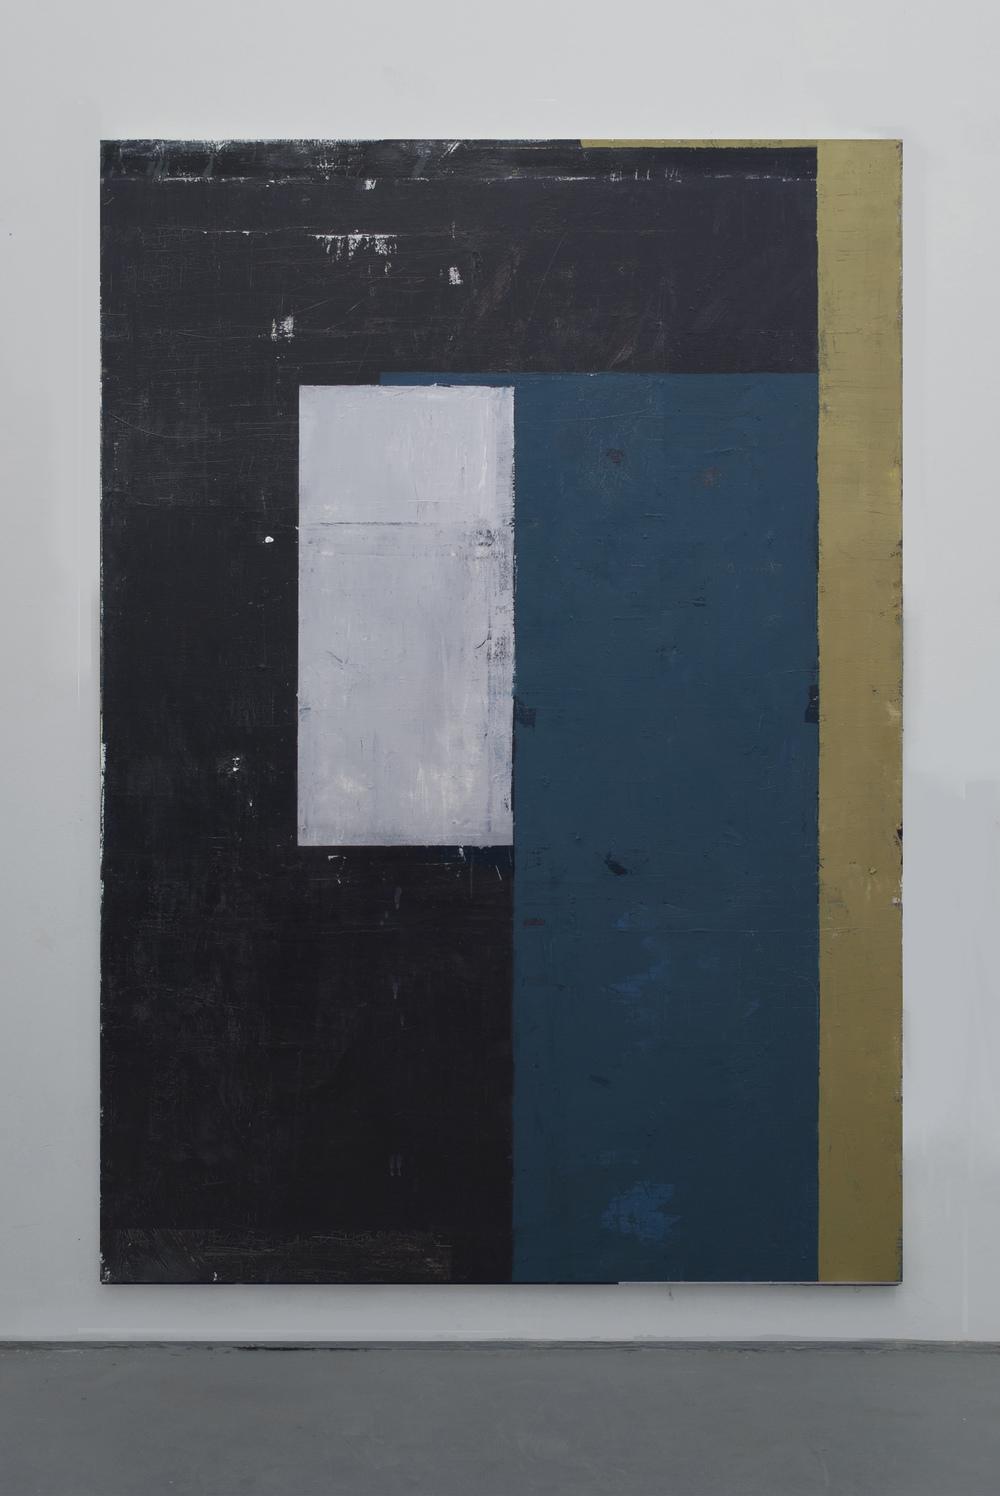 200x140cm (2)-1.JPG